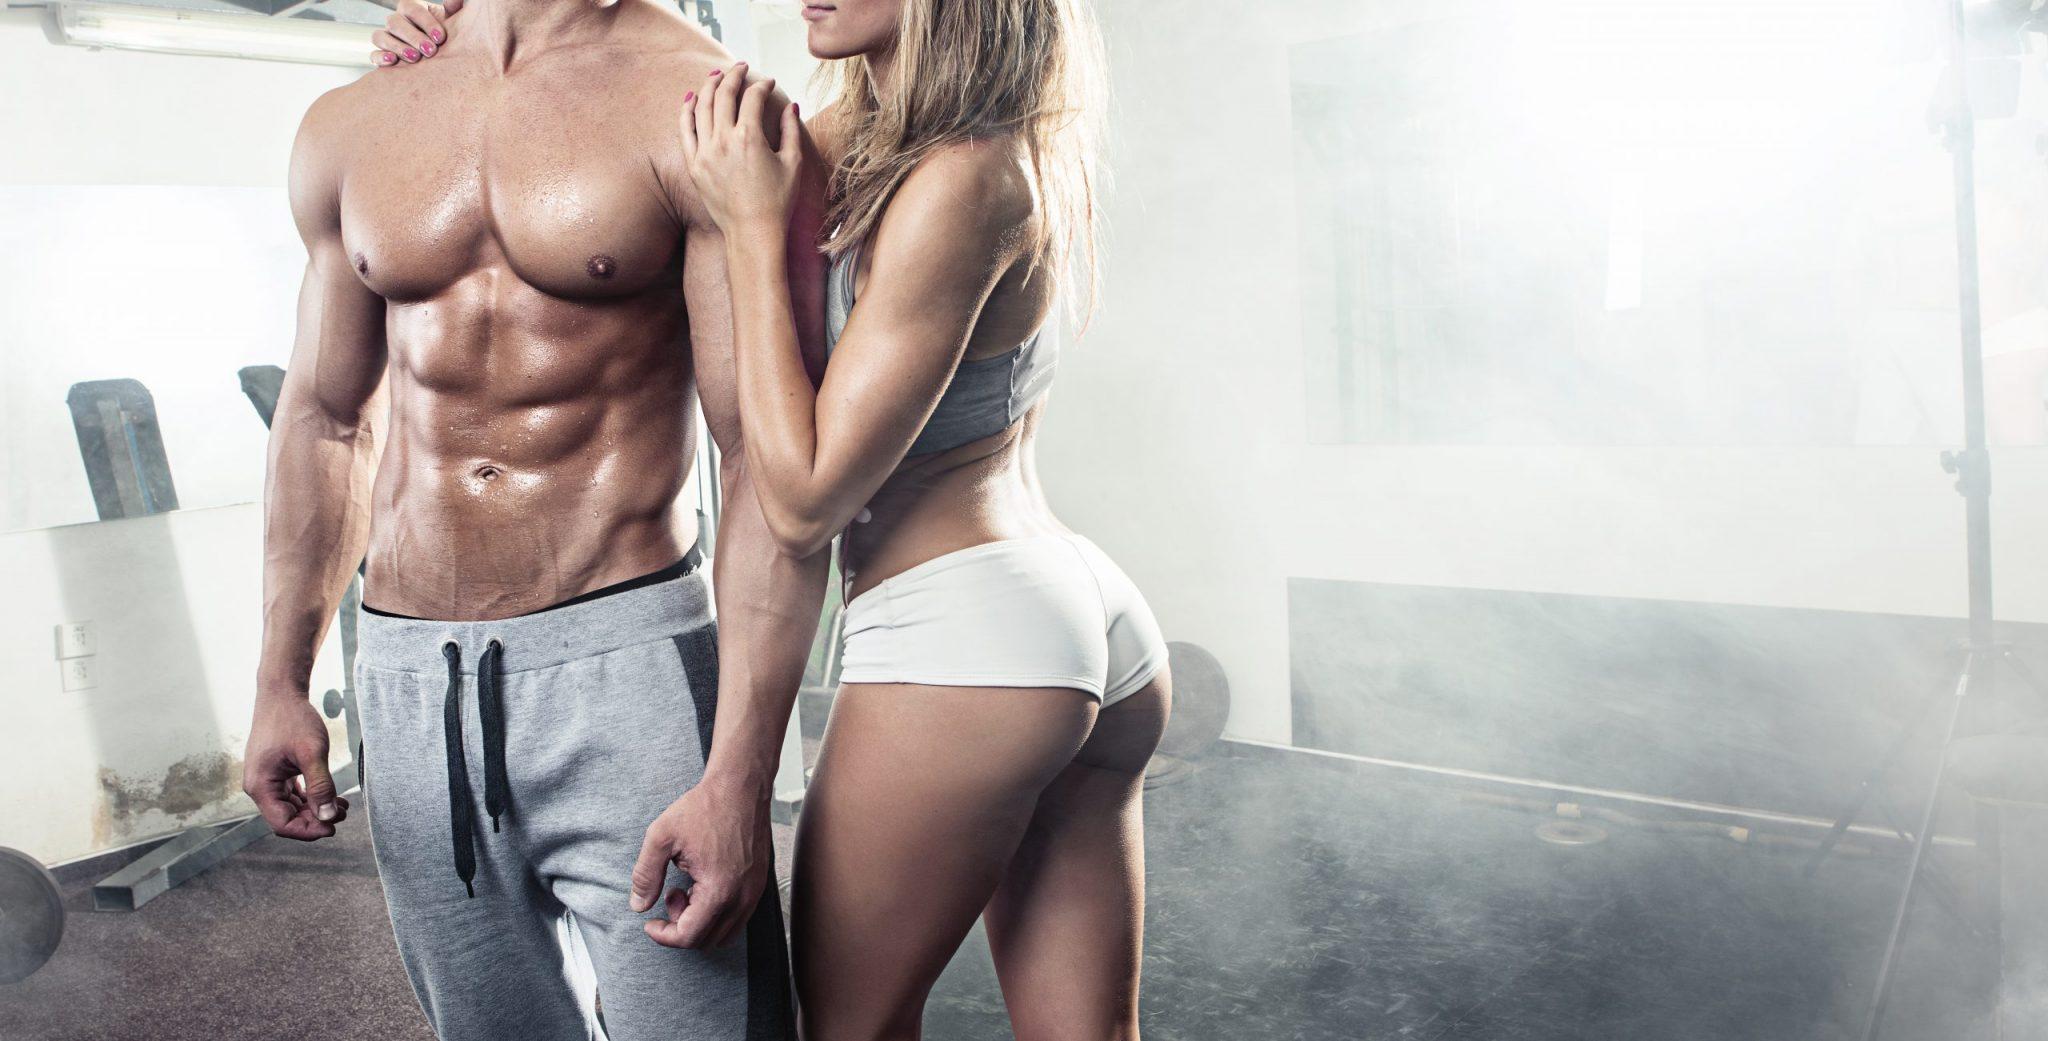 Emsculpt-增肌減脂-有效鍛鍊肌肉